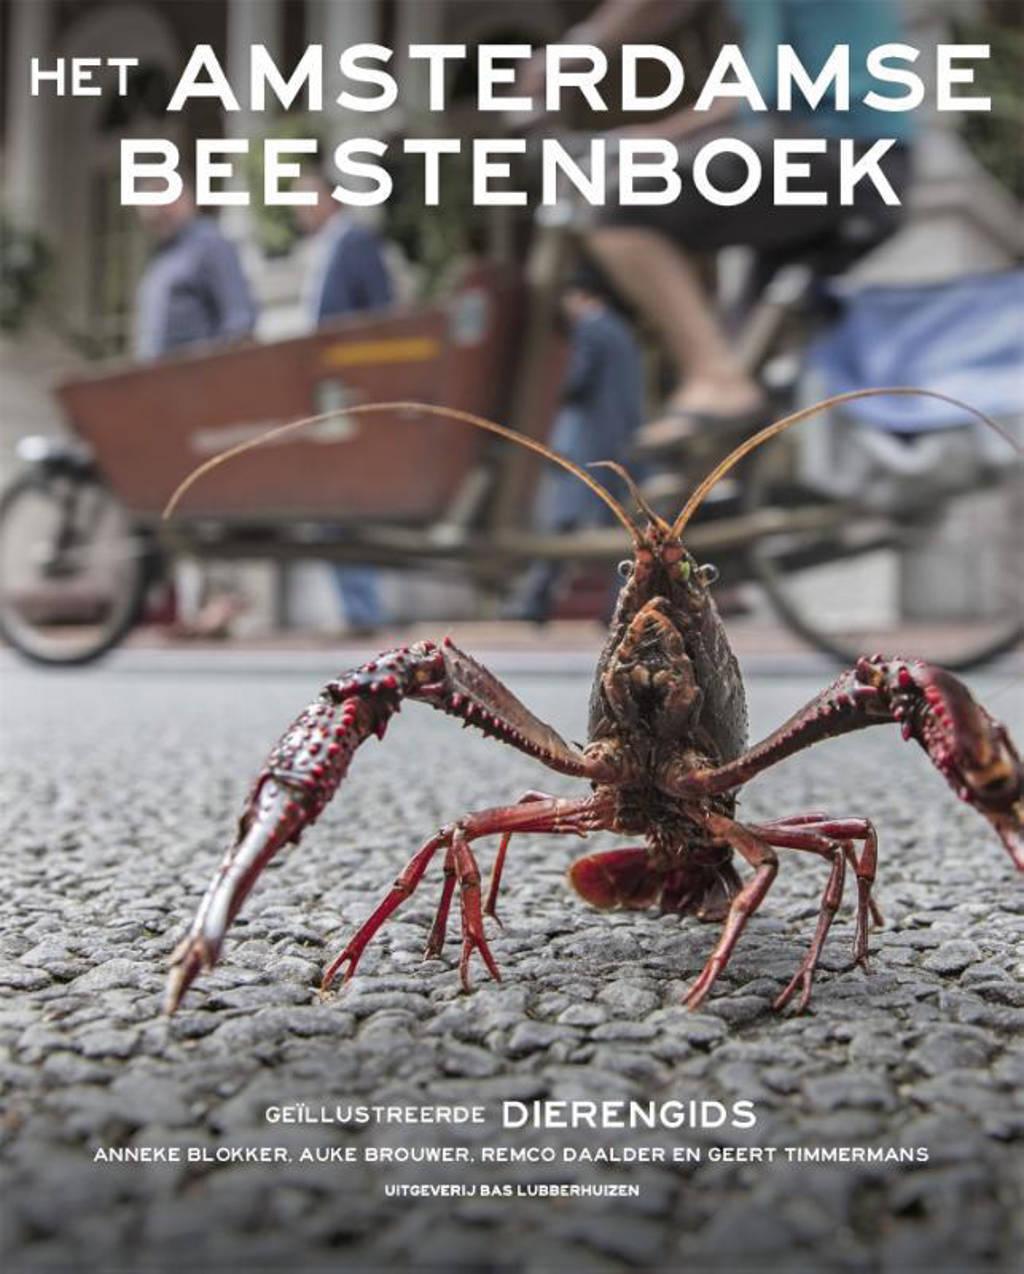 Het Amsterdamse beestenboek - Anneke Blokker, Auke Brouwer, Remco Daalder, e.a.